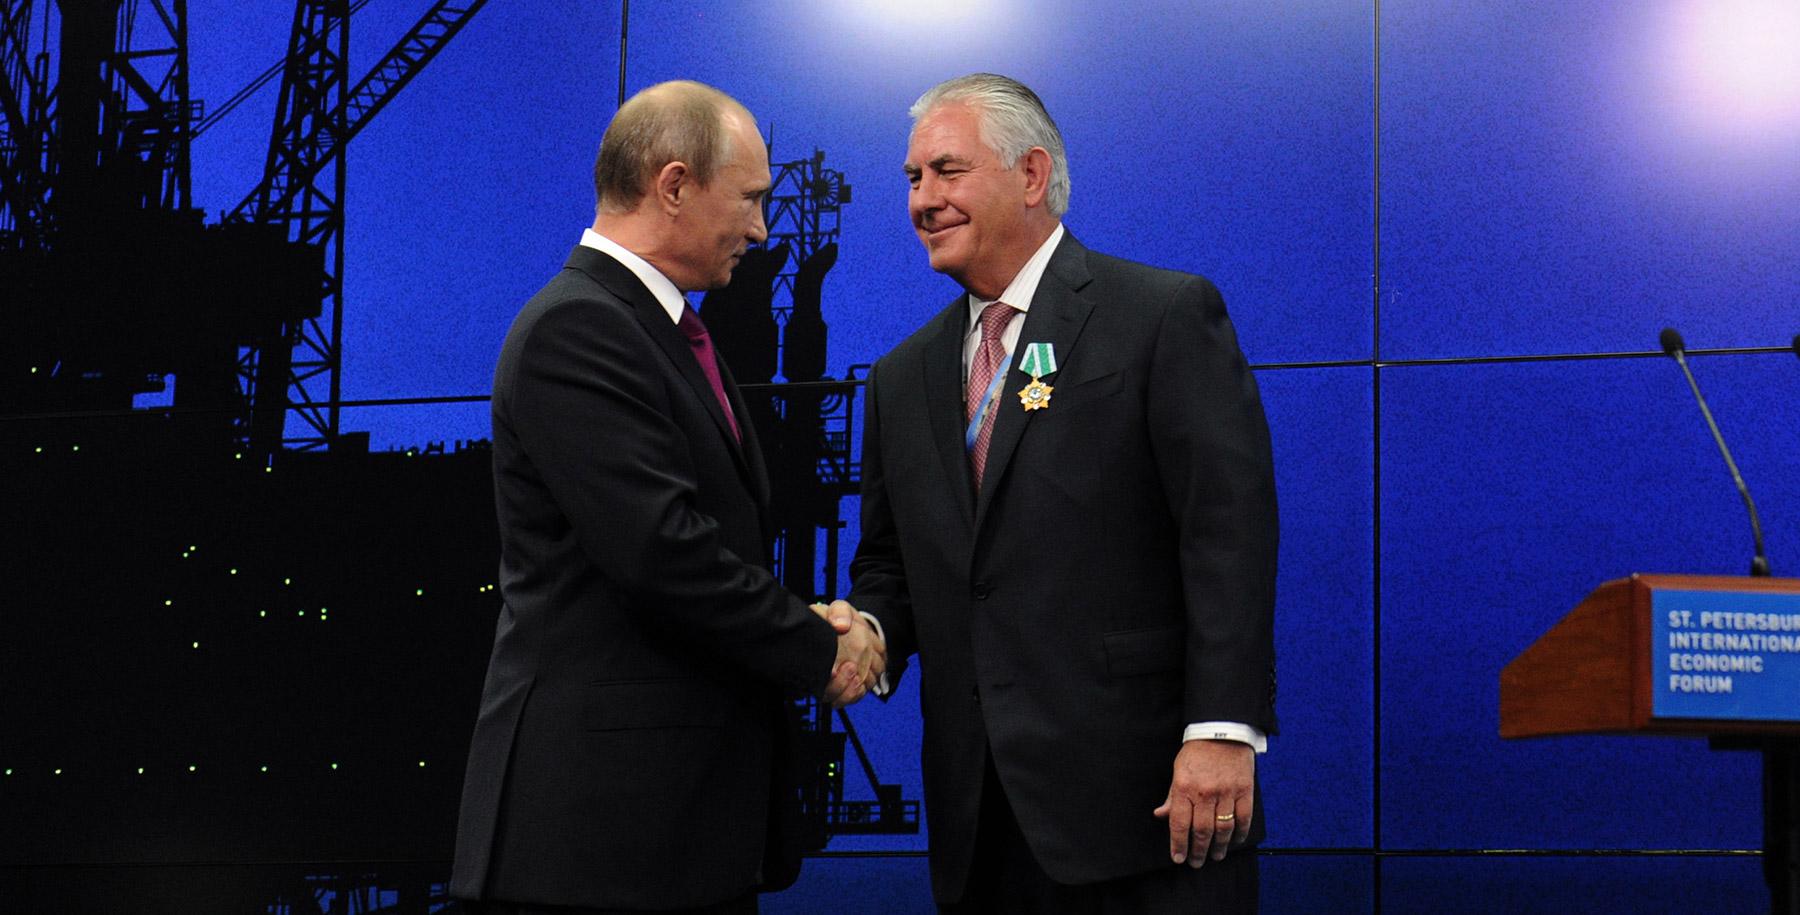 Rex Tillerson Could Be America's Most Dangerous Secretary of